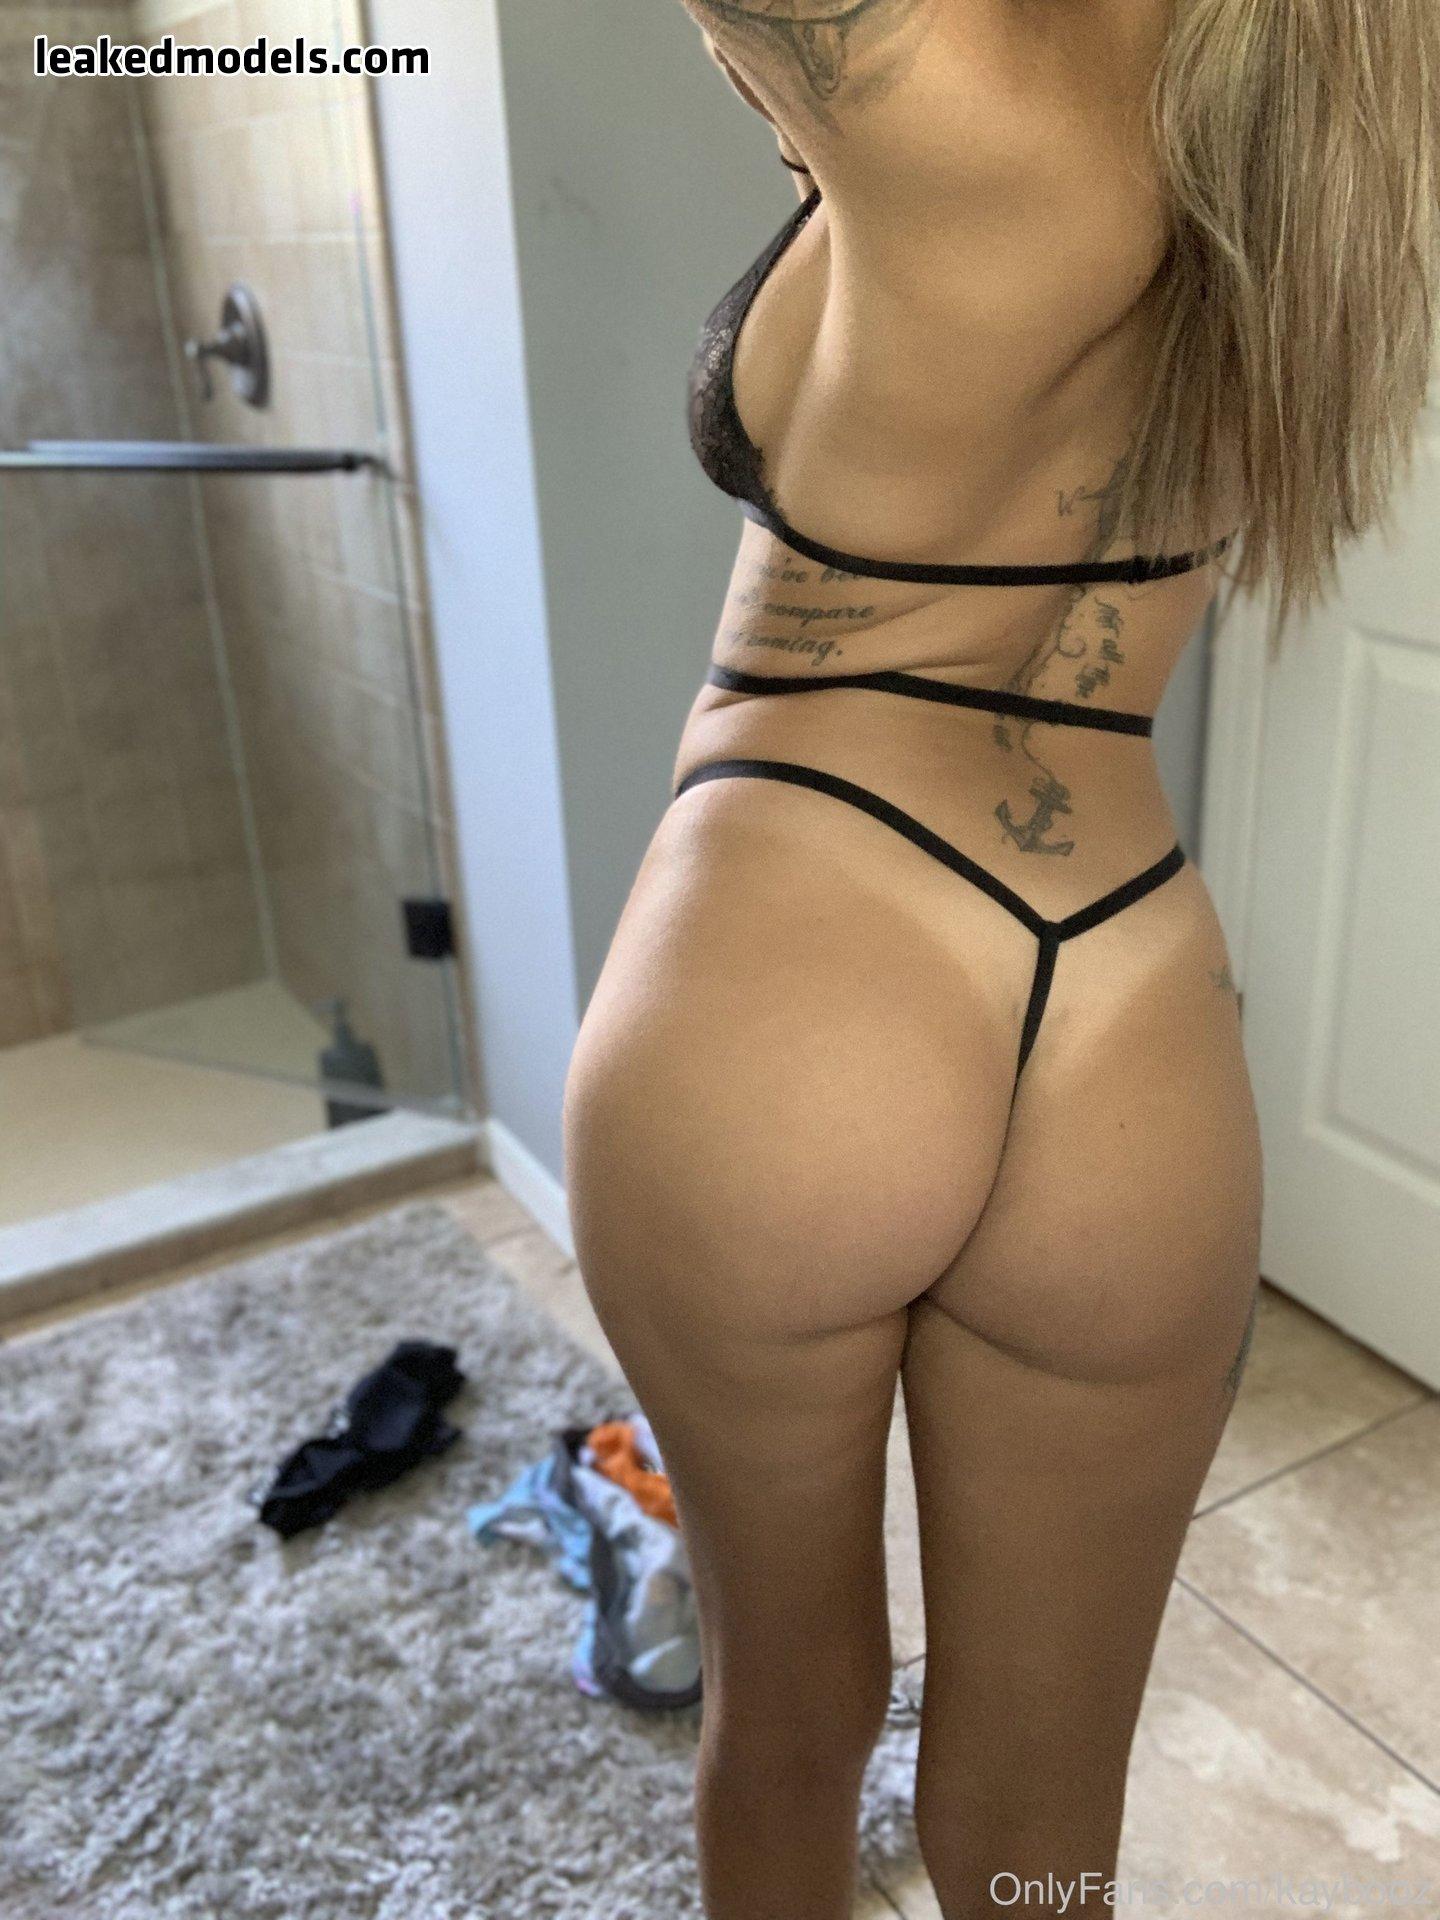 kaybooz OnlyFans Nude Leaks (21 Photos)